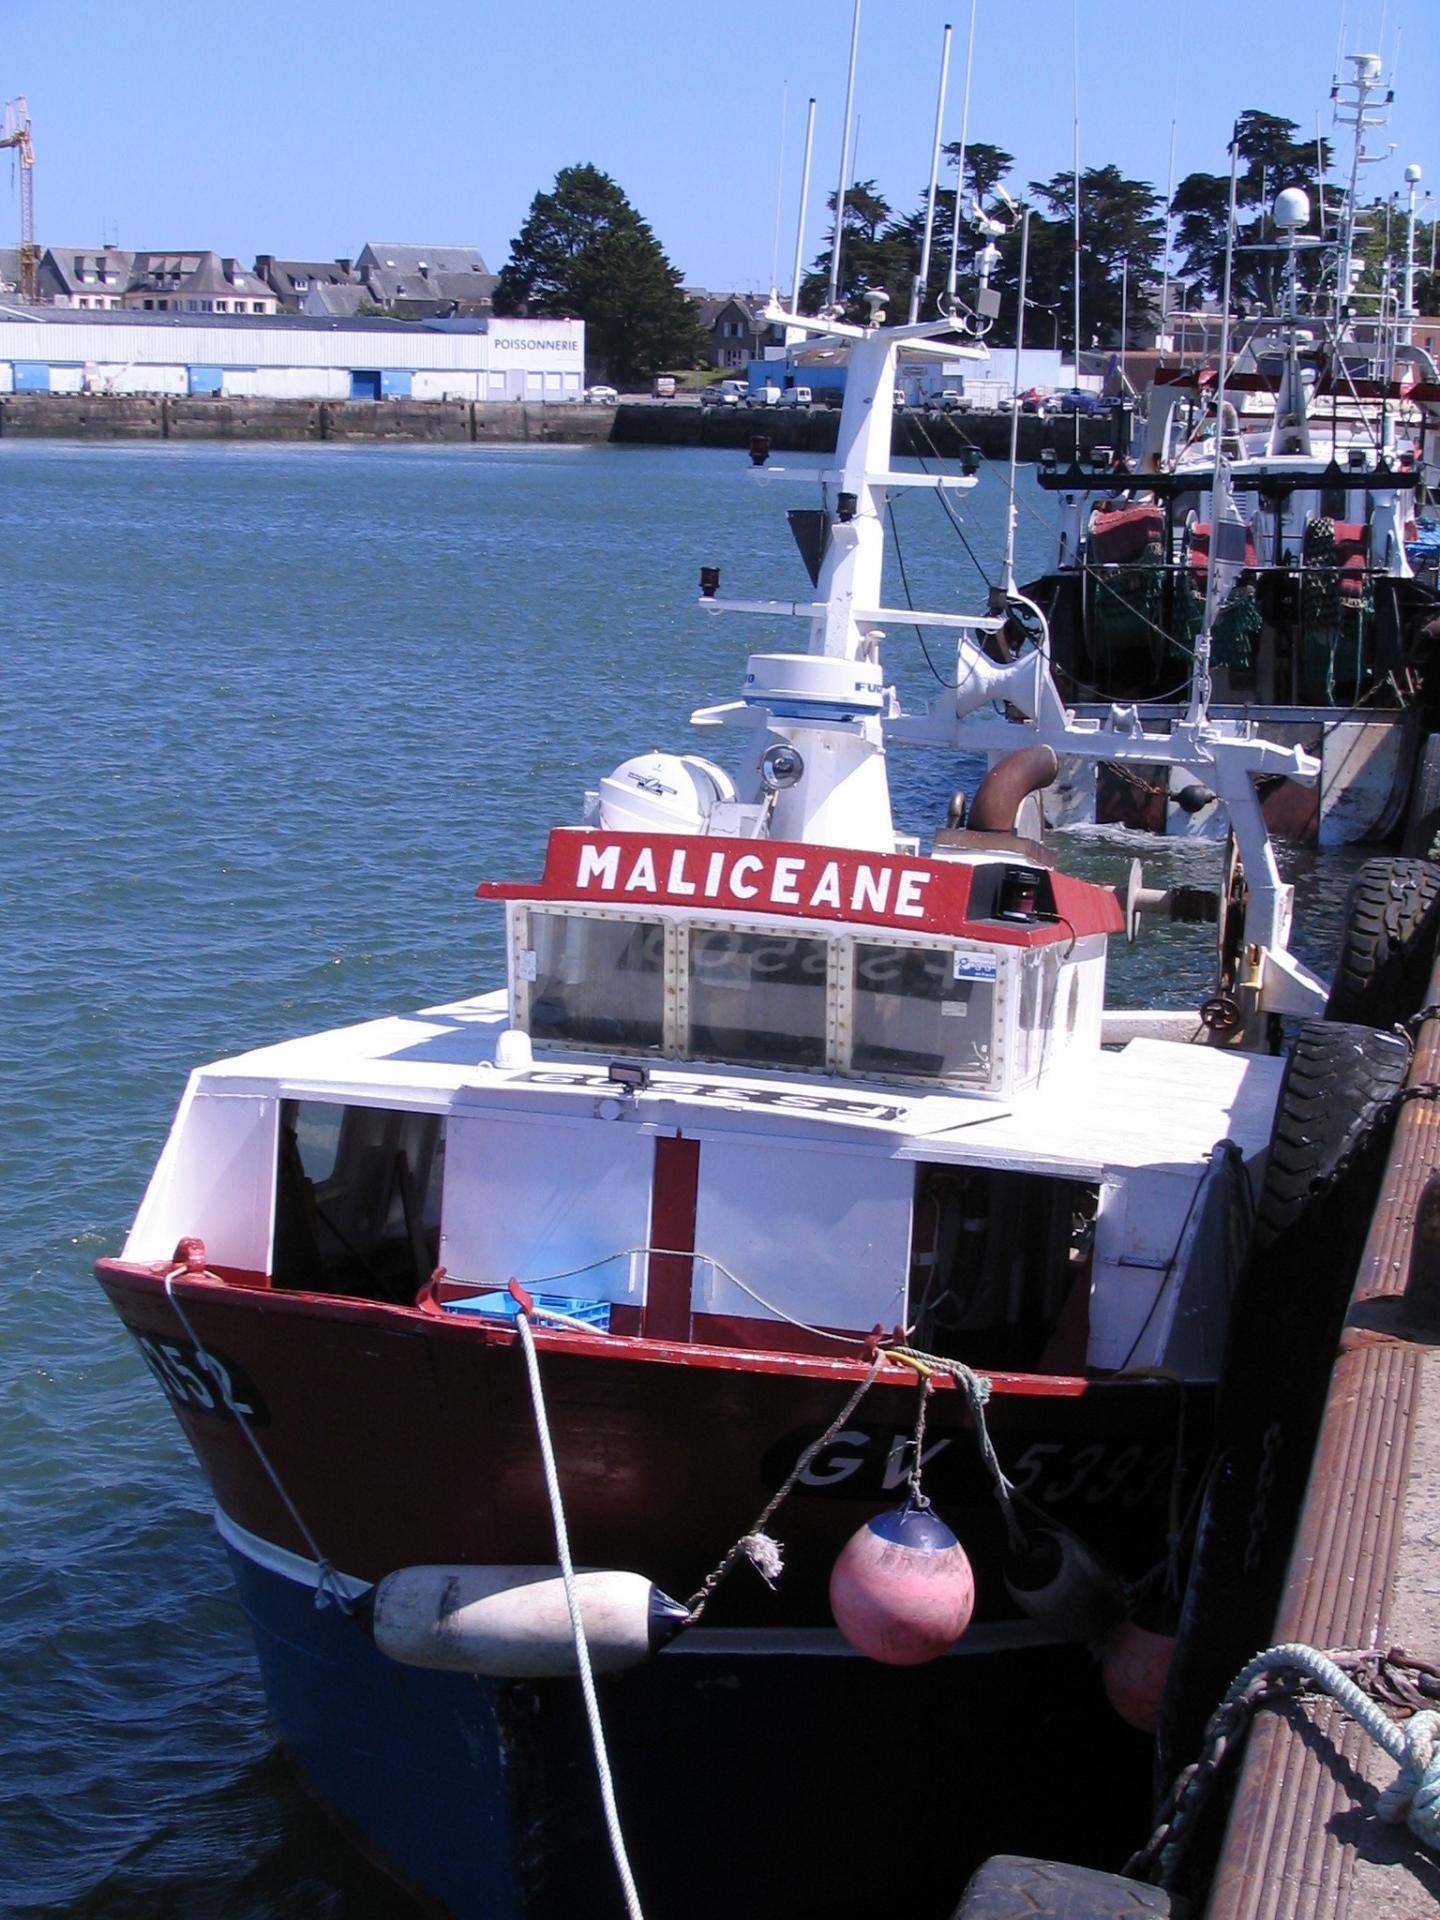 200514 maliceane b 2